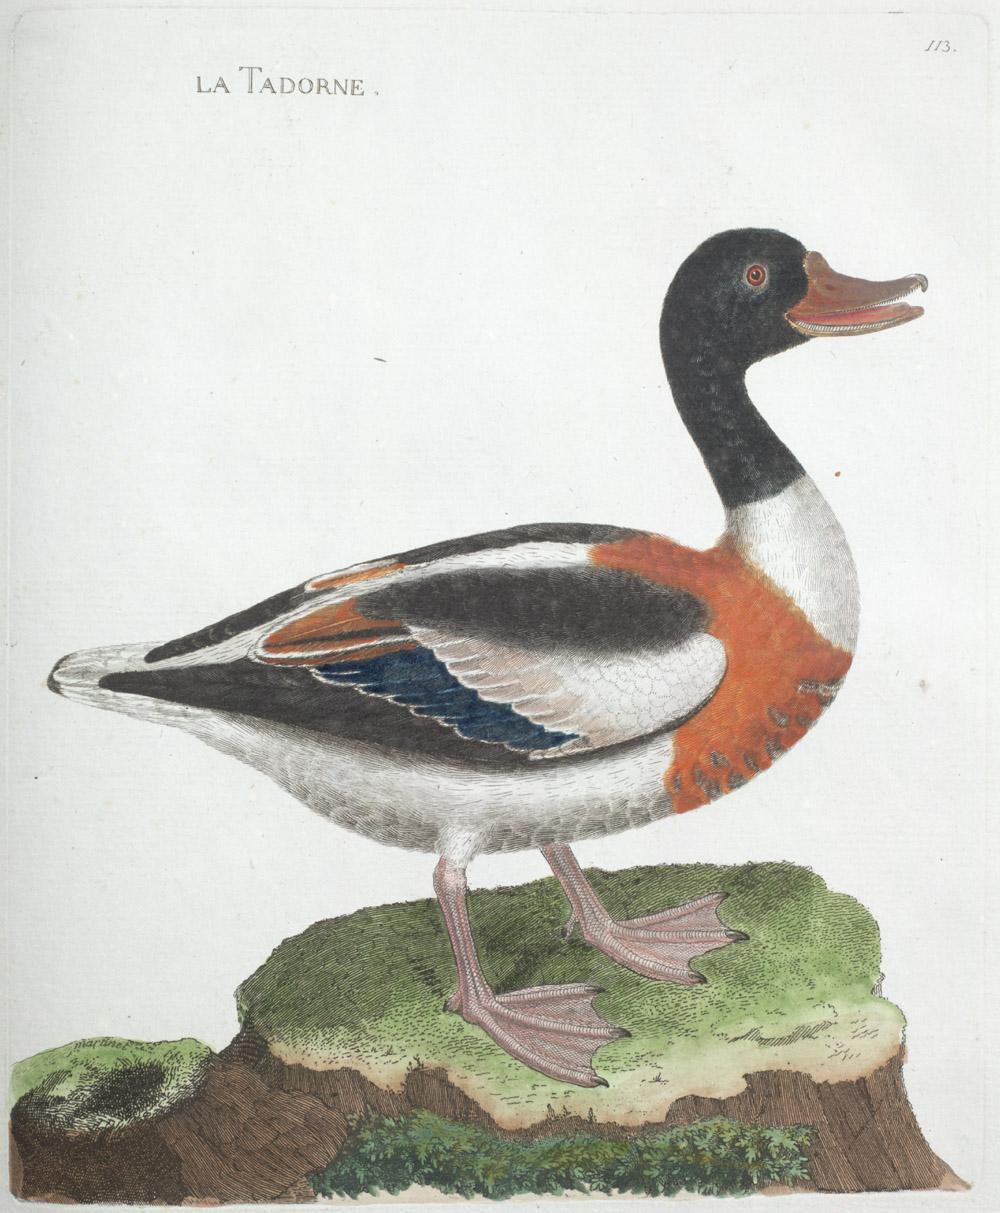 Plate 113: La Tadorne,  Image number:SIL13-1-231b